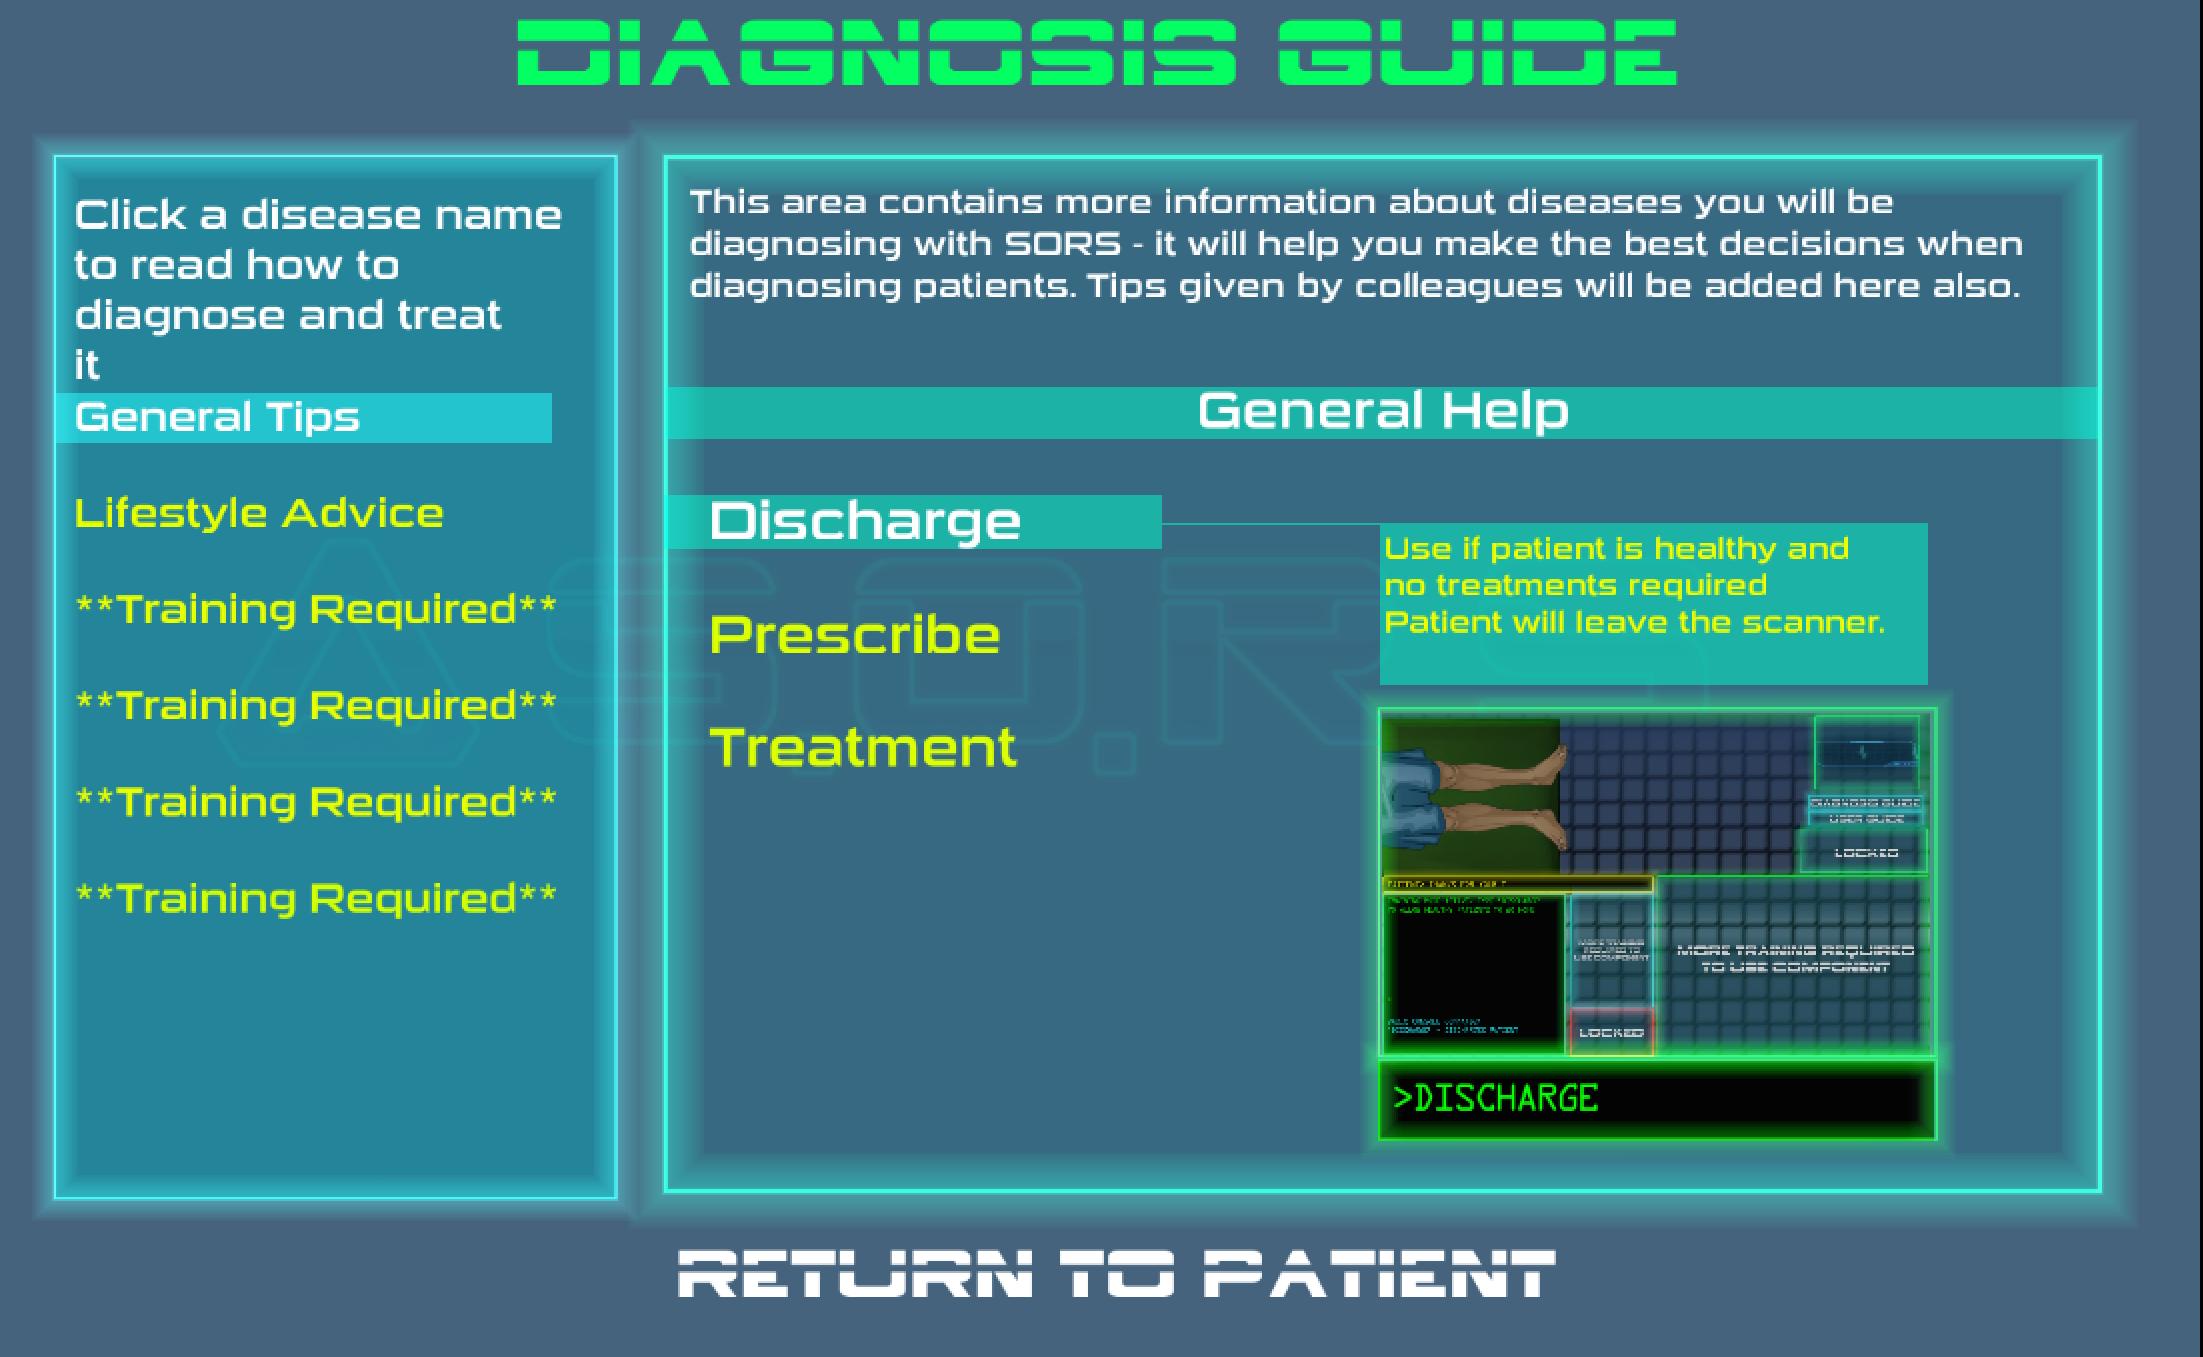 After- new <em>SORS</em> diagnosis guide screen